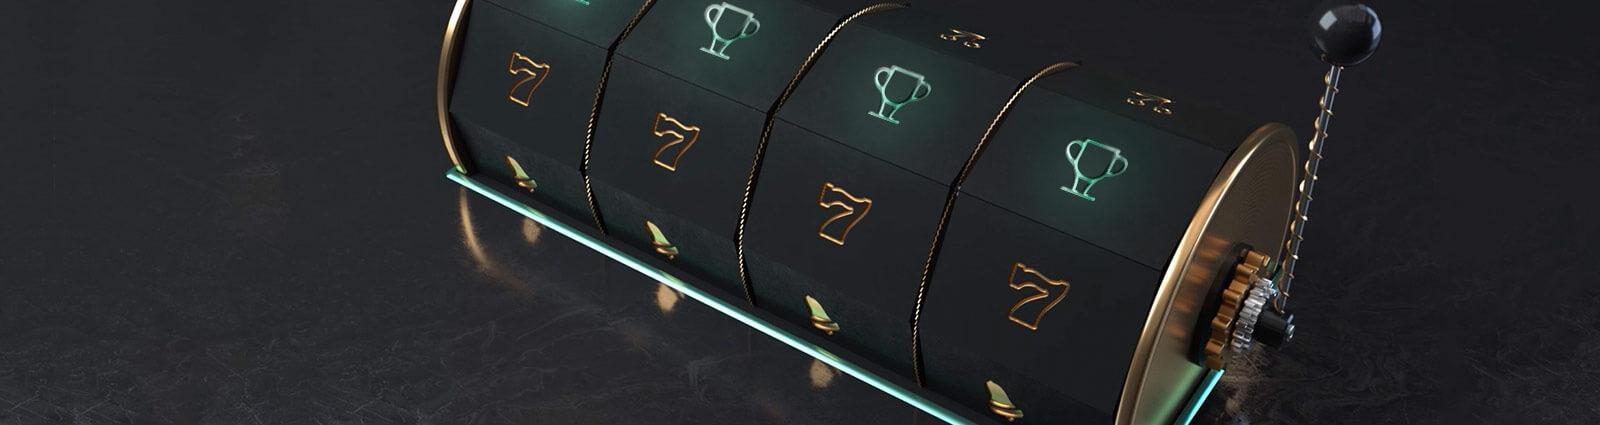 Spilleautomater-pa-nett